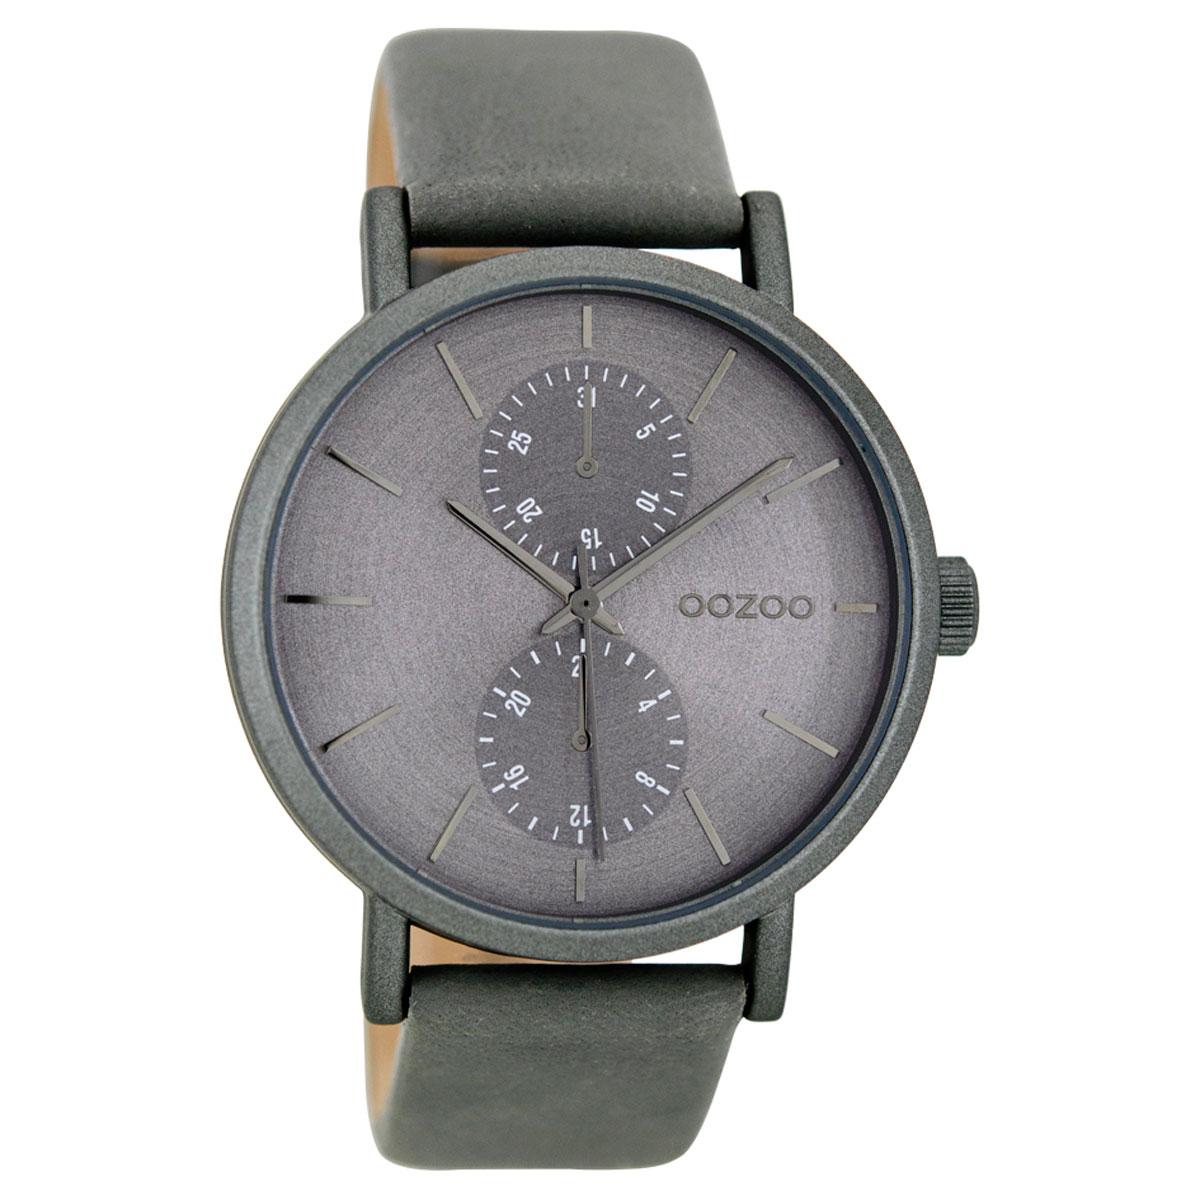 OOZOO Timepieces γυναικείο ρολόι με γκρι μεταλλική κάσα και γκρι δερμάτινο  λουράκι C8686 3449d1bdeff